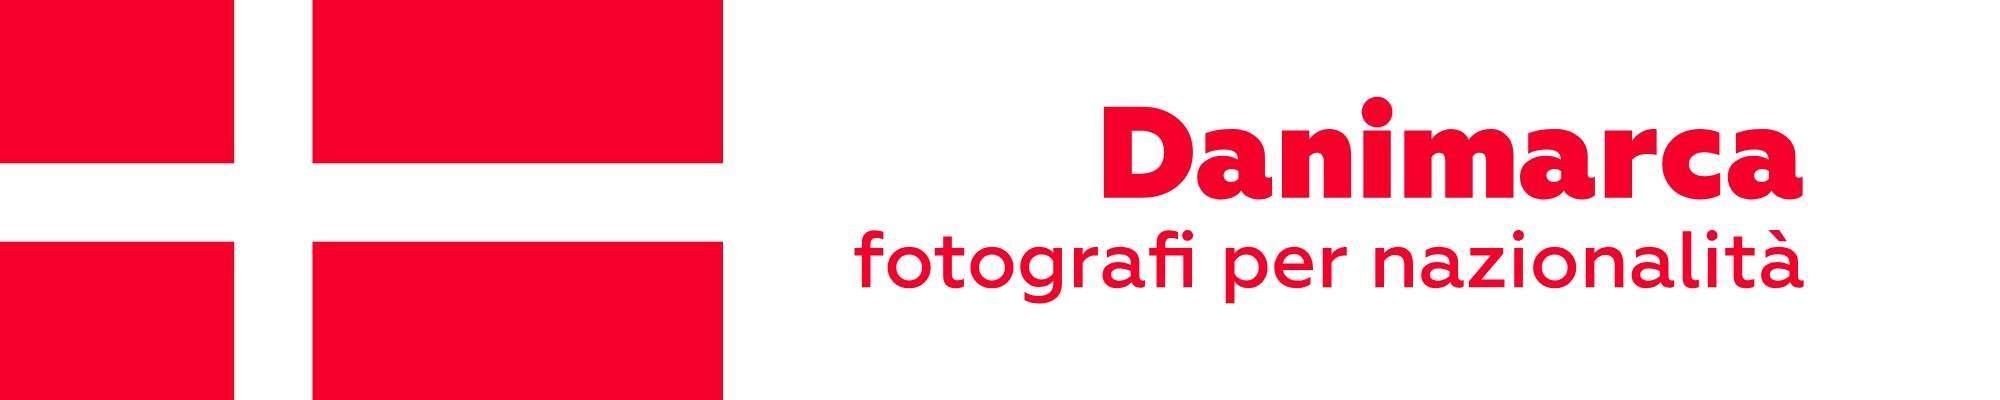 fotografi famosi danesi